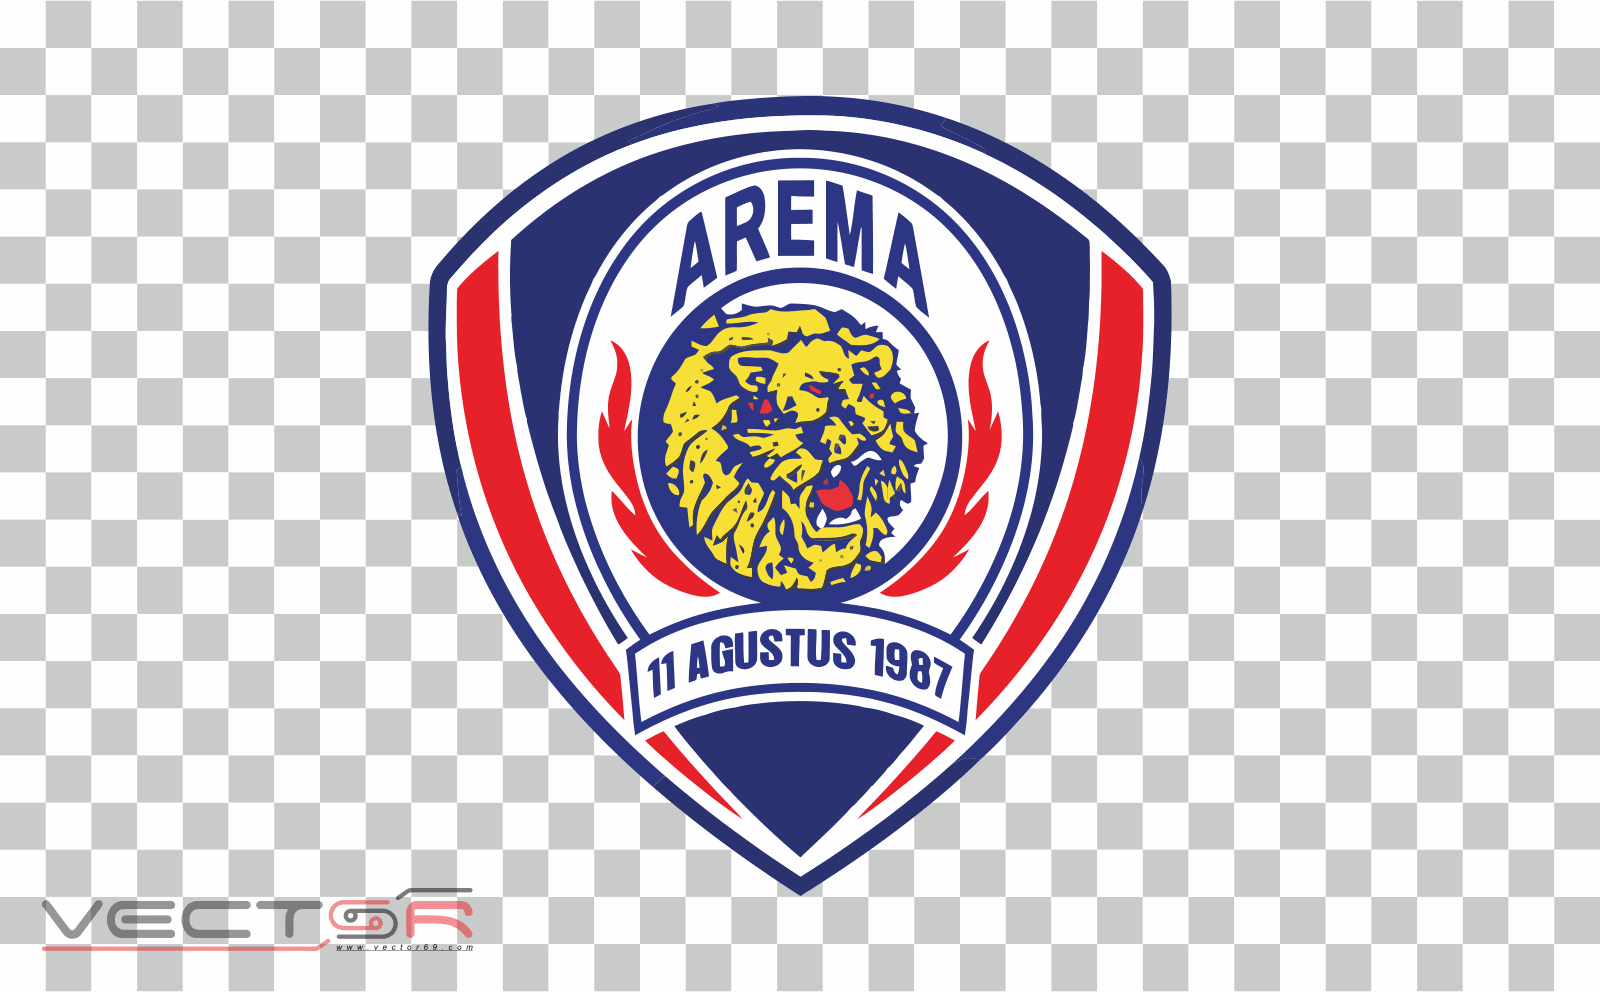 Arema Cronus (2013) Logo - Download .PNG (Portable Network Graphics) Transparent Images